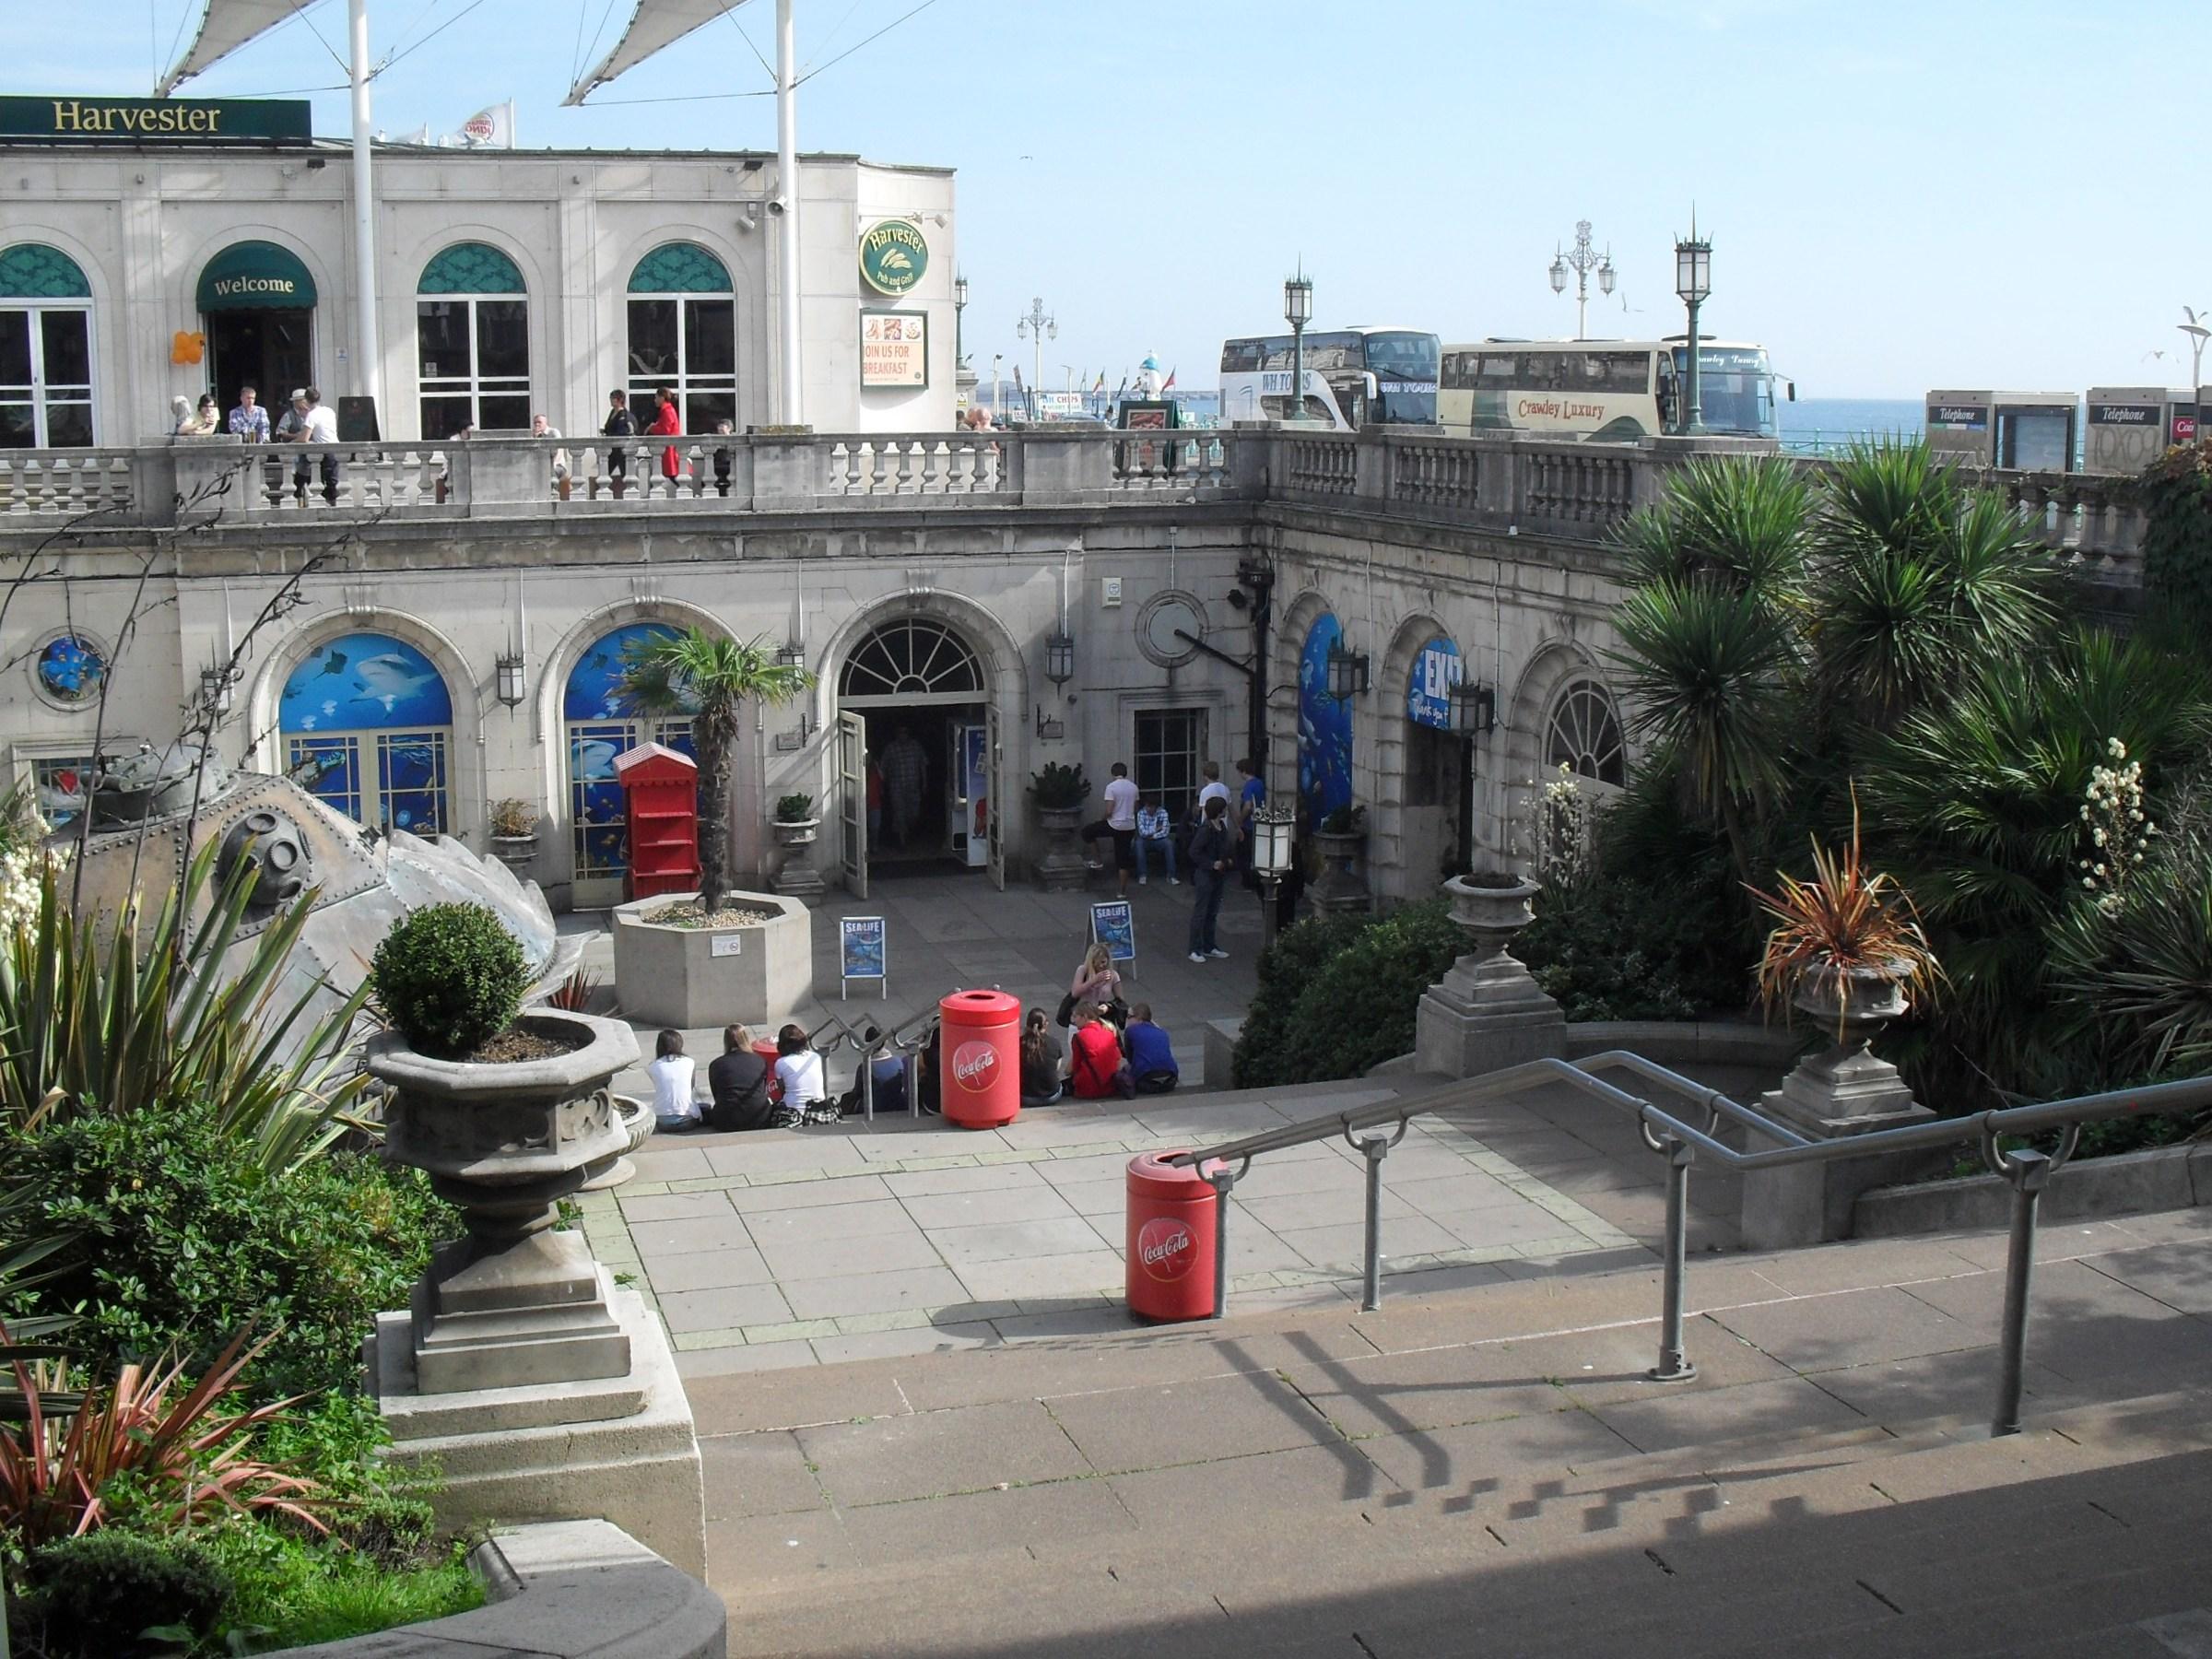 Sea Life Brighton ile ilgili görsel sonucu